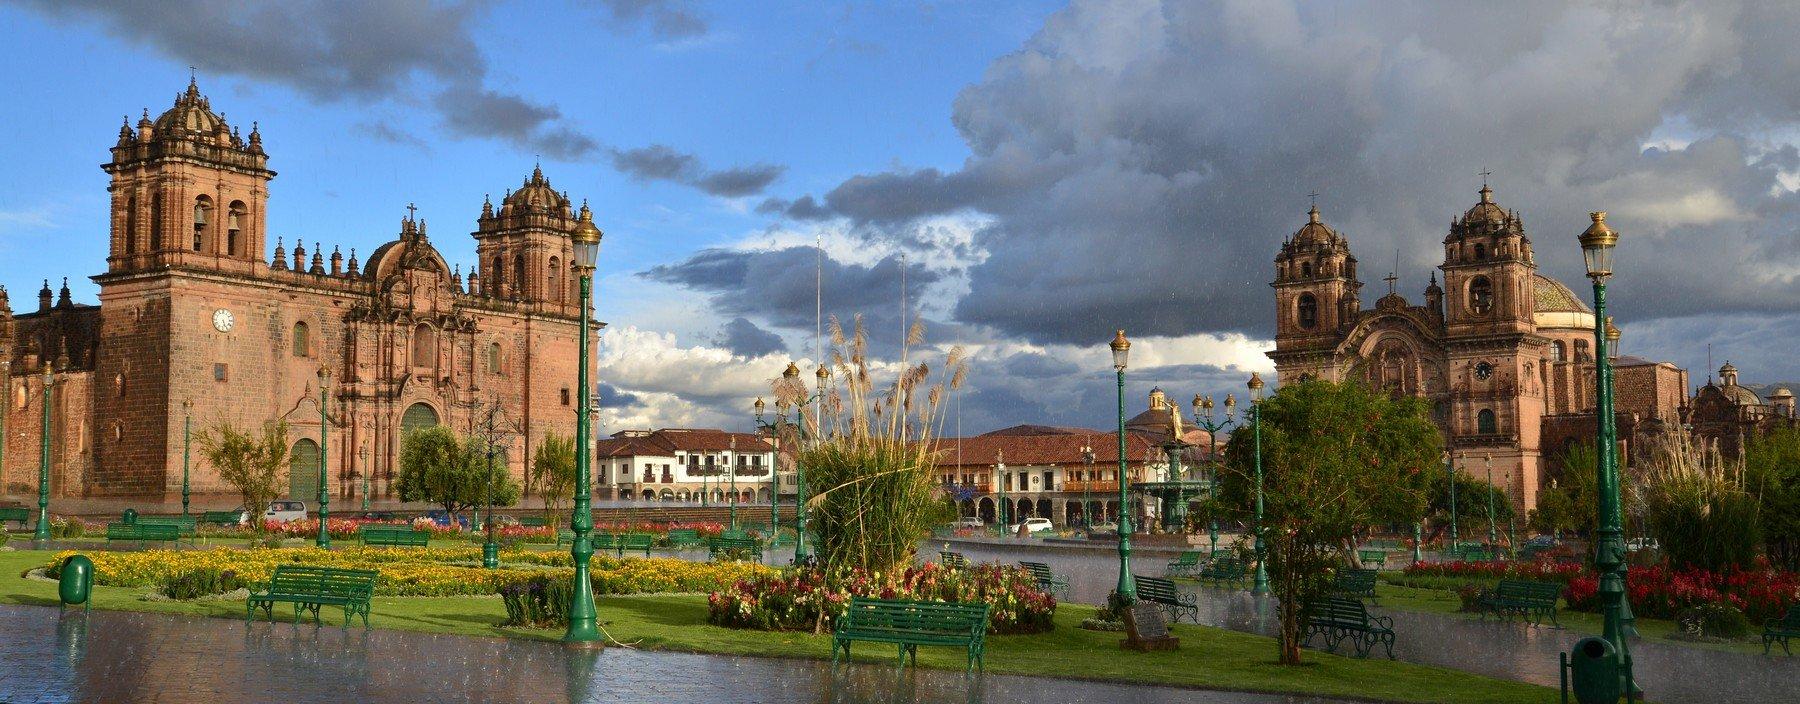 pe, cuzco, plaza de armas (1).jpg